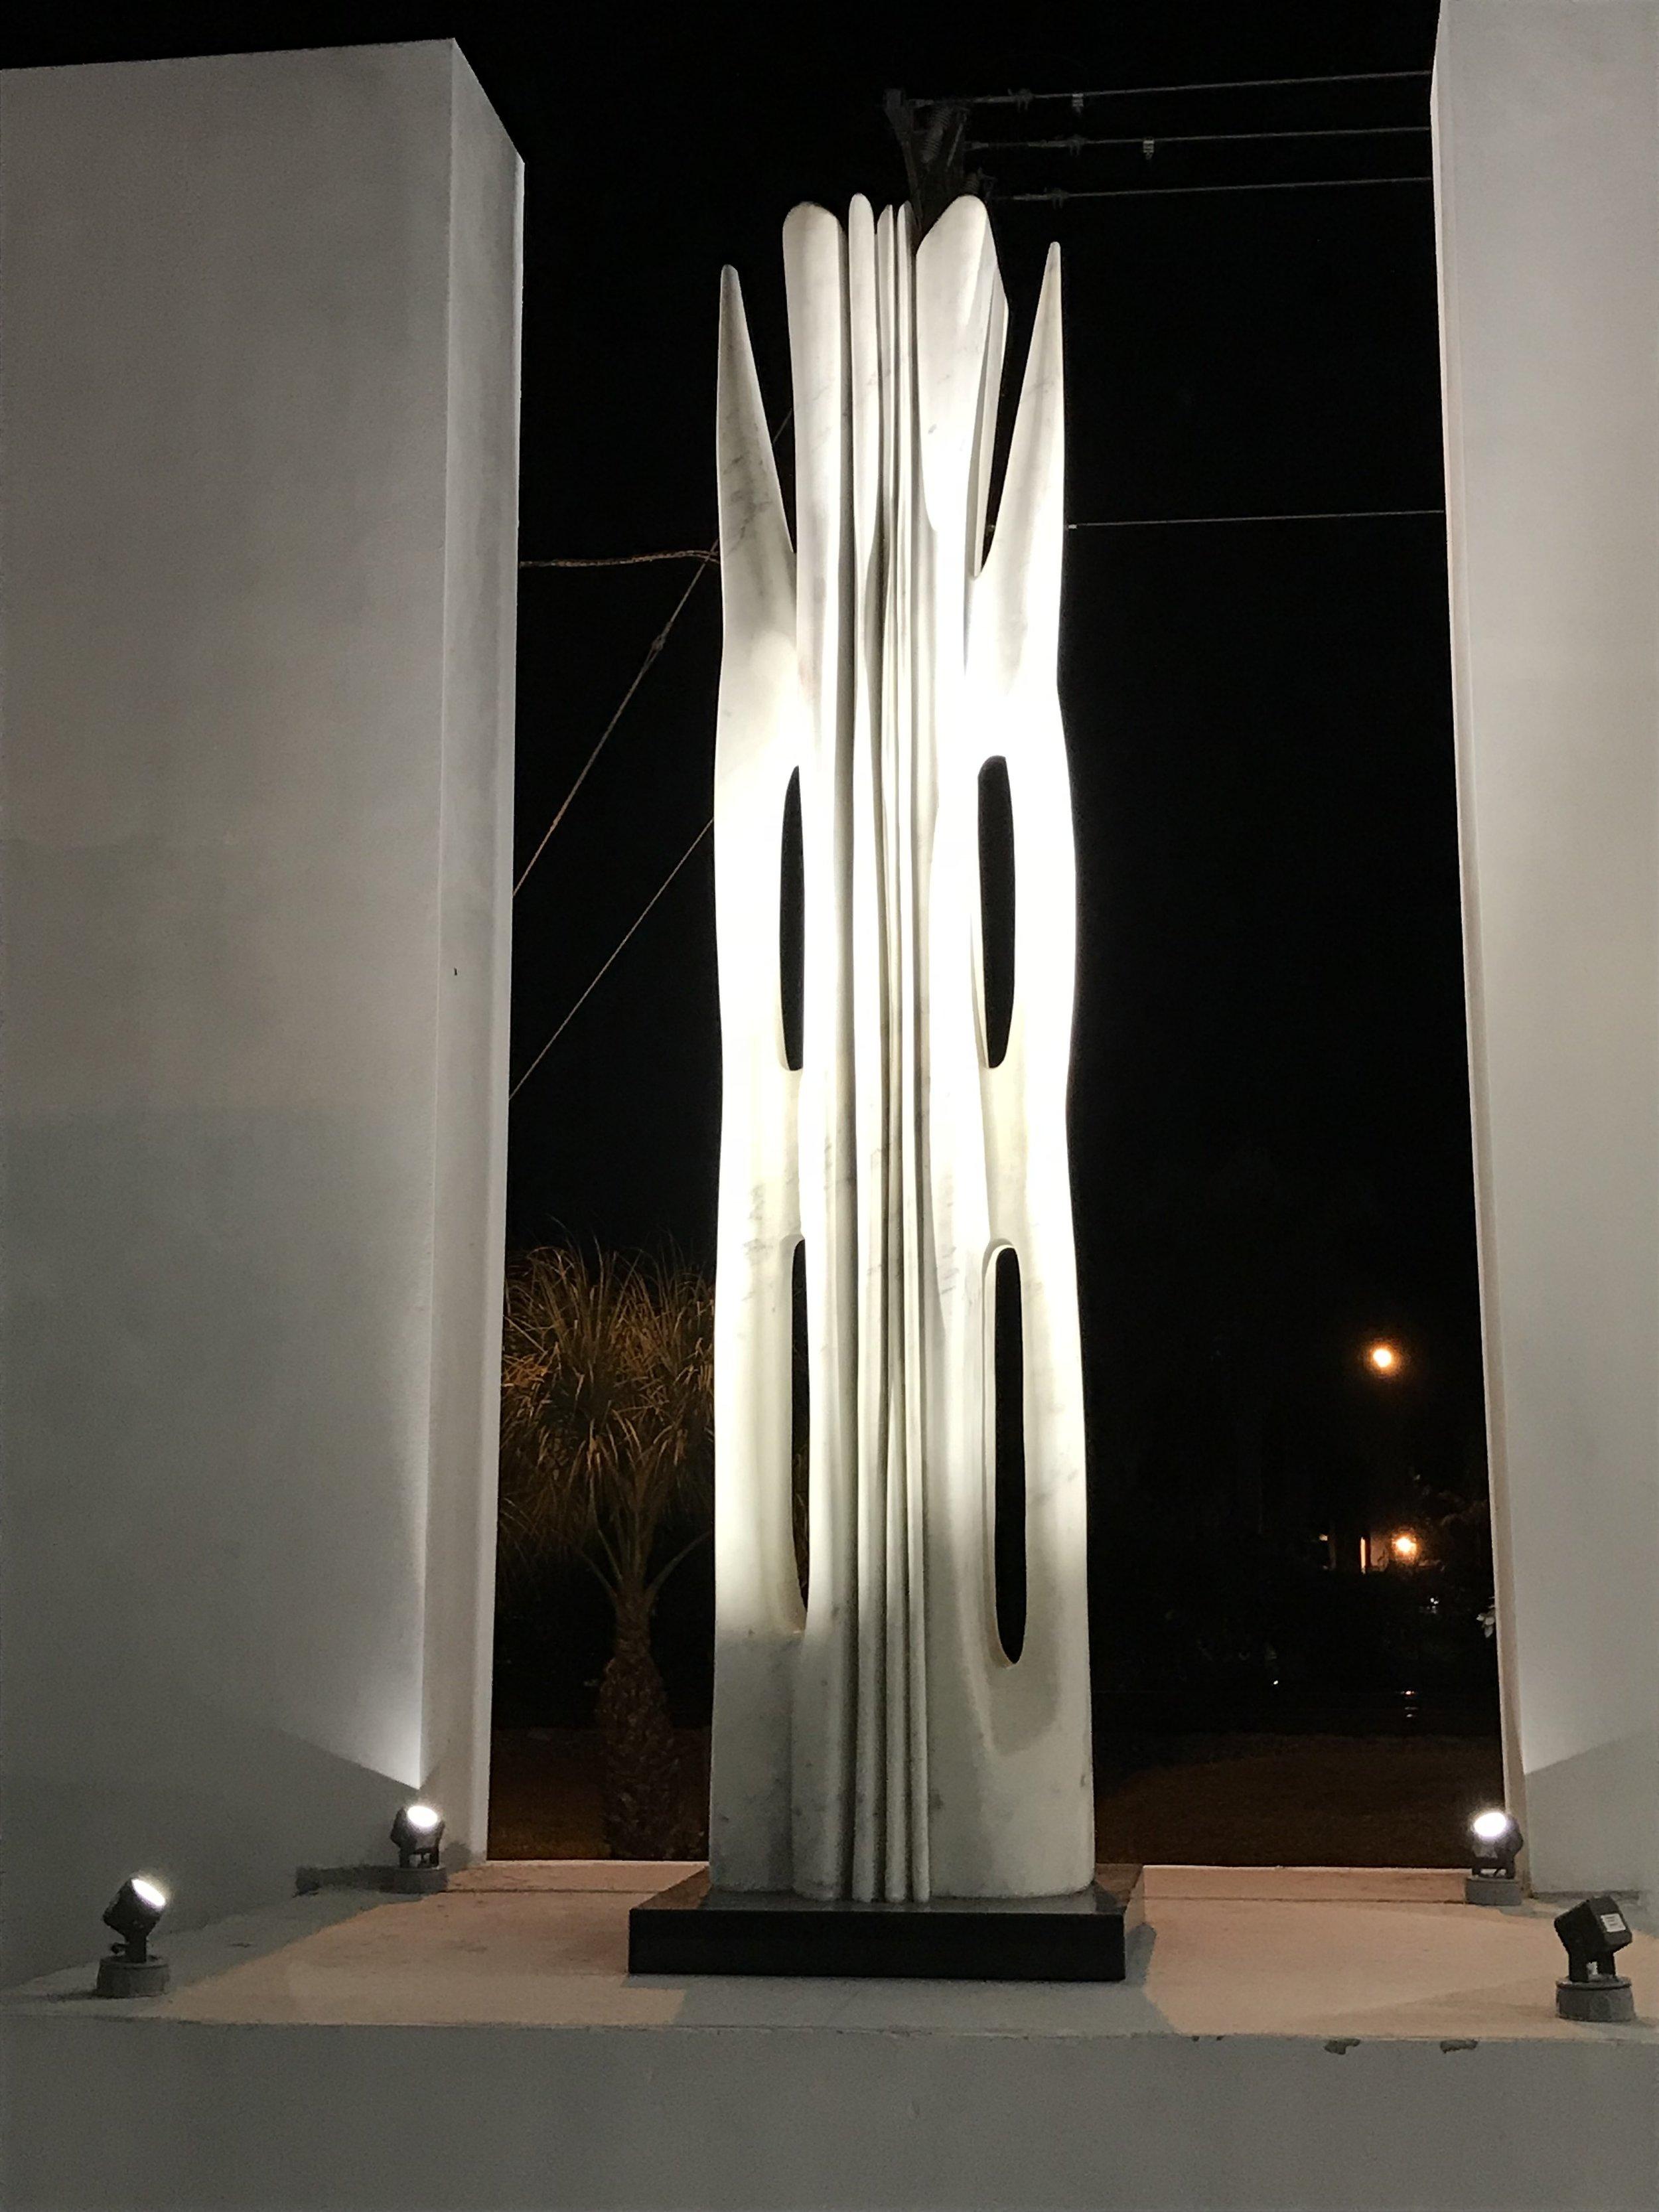 Atchugarry Art Center in North Miami. Outdoor sculpture illuminated by Targetti's new DART Medium spot light.